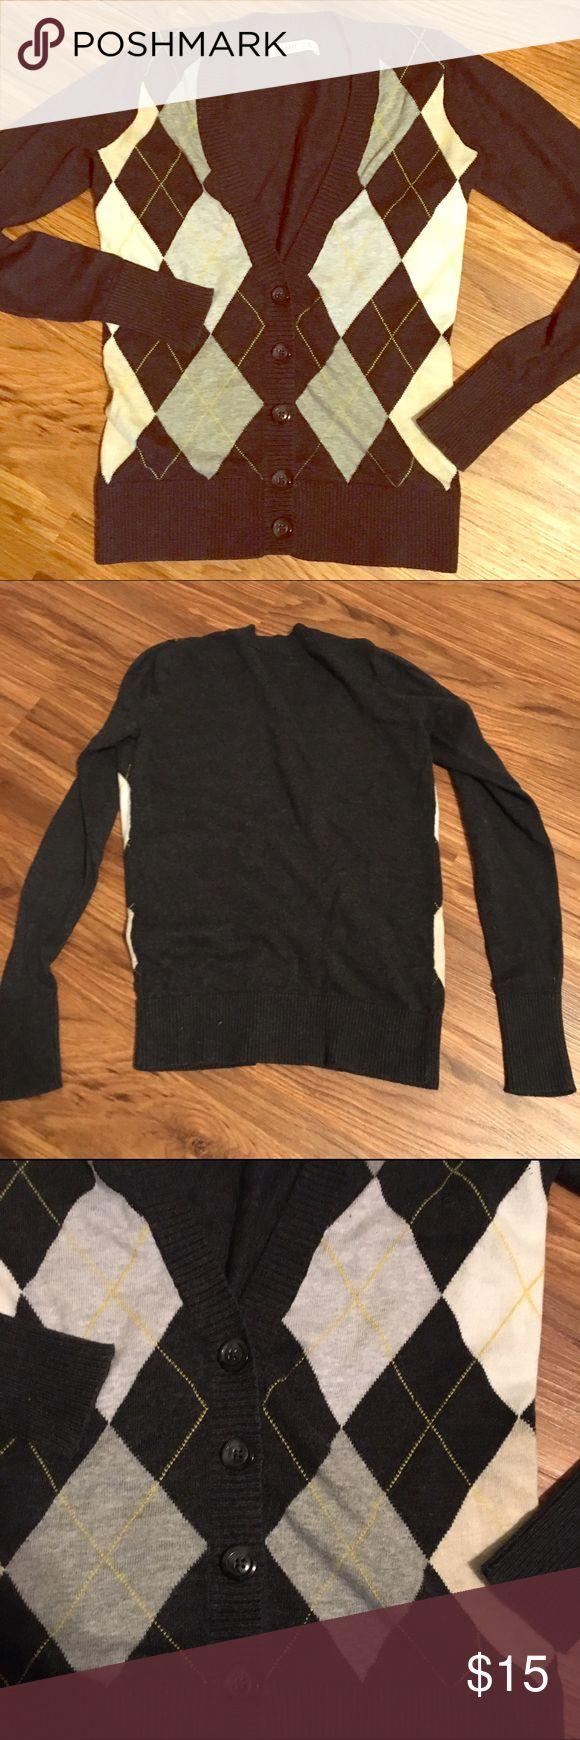 Dark grey argyle v-neck cardigan Argyle v-neck cardigan in dark grey, white, light grey with yellow accent. Still in great condition! Old Navy Sweaters Cardigans